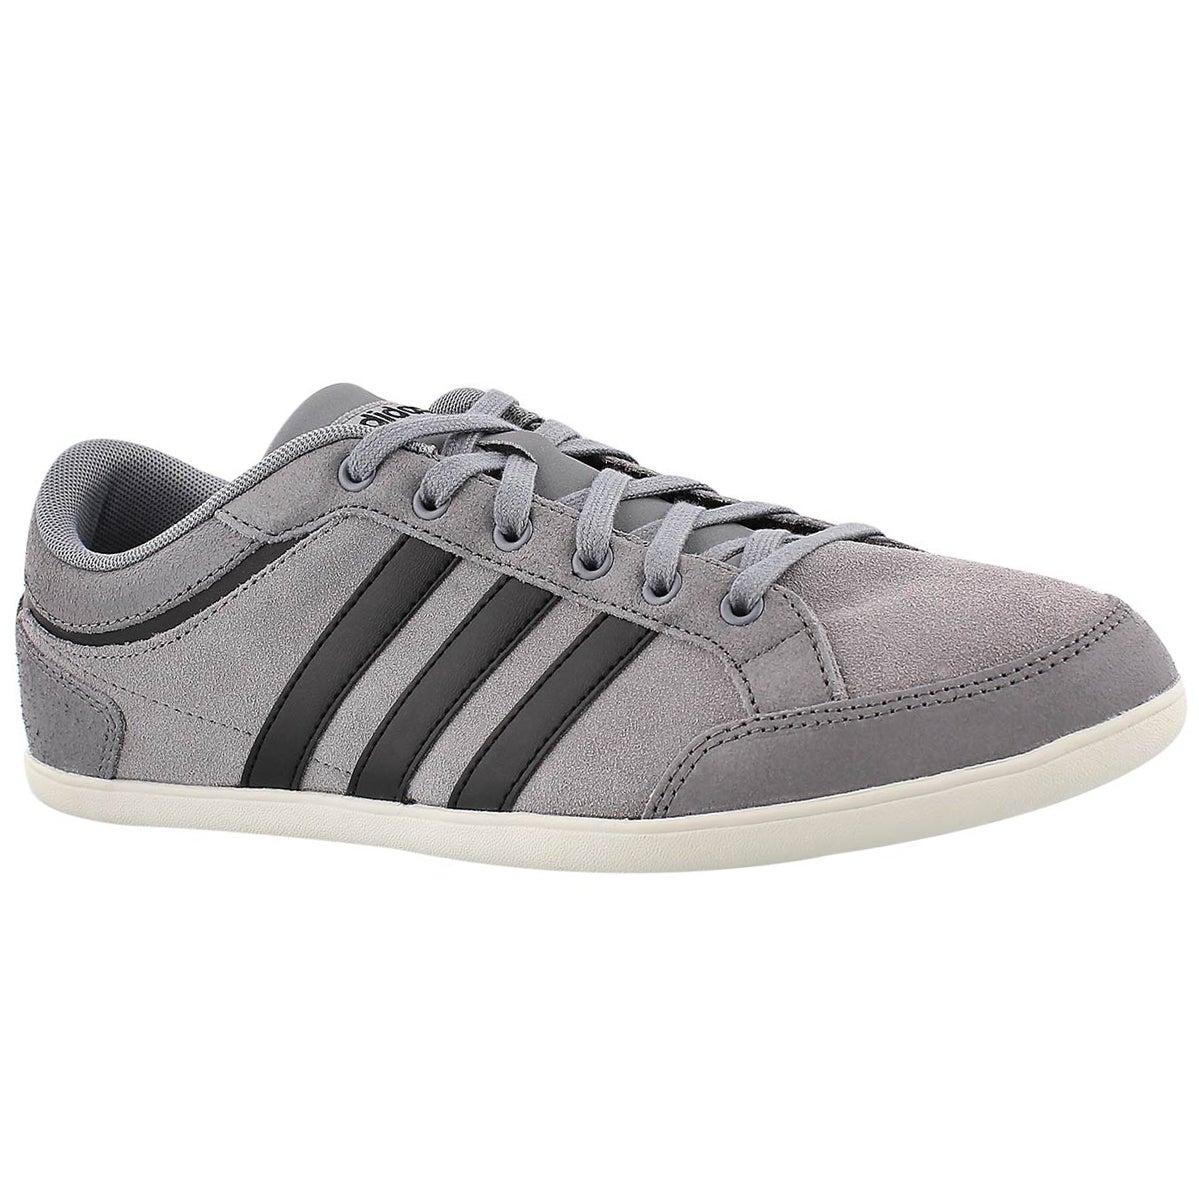 Mns Unwind grey lace up sneaker